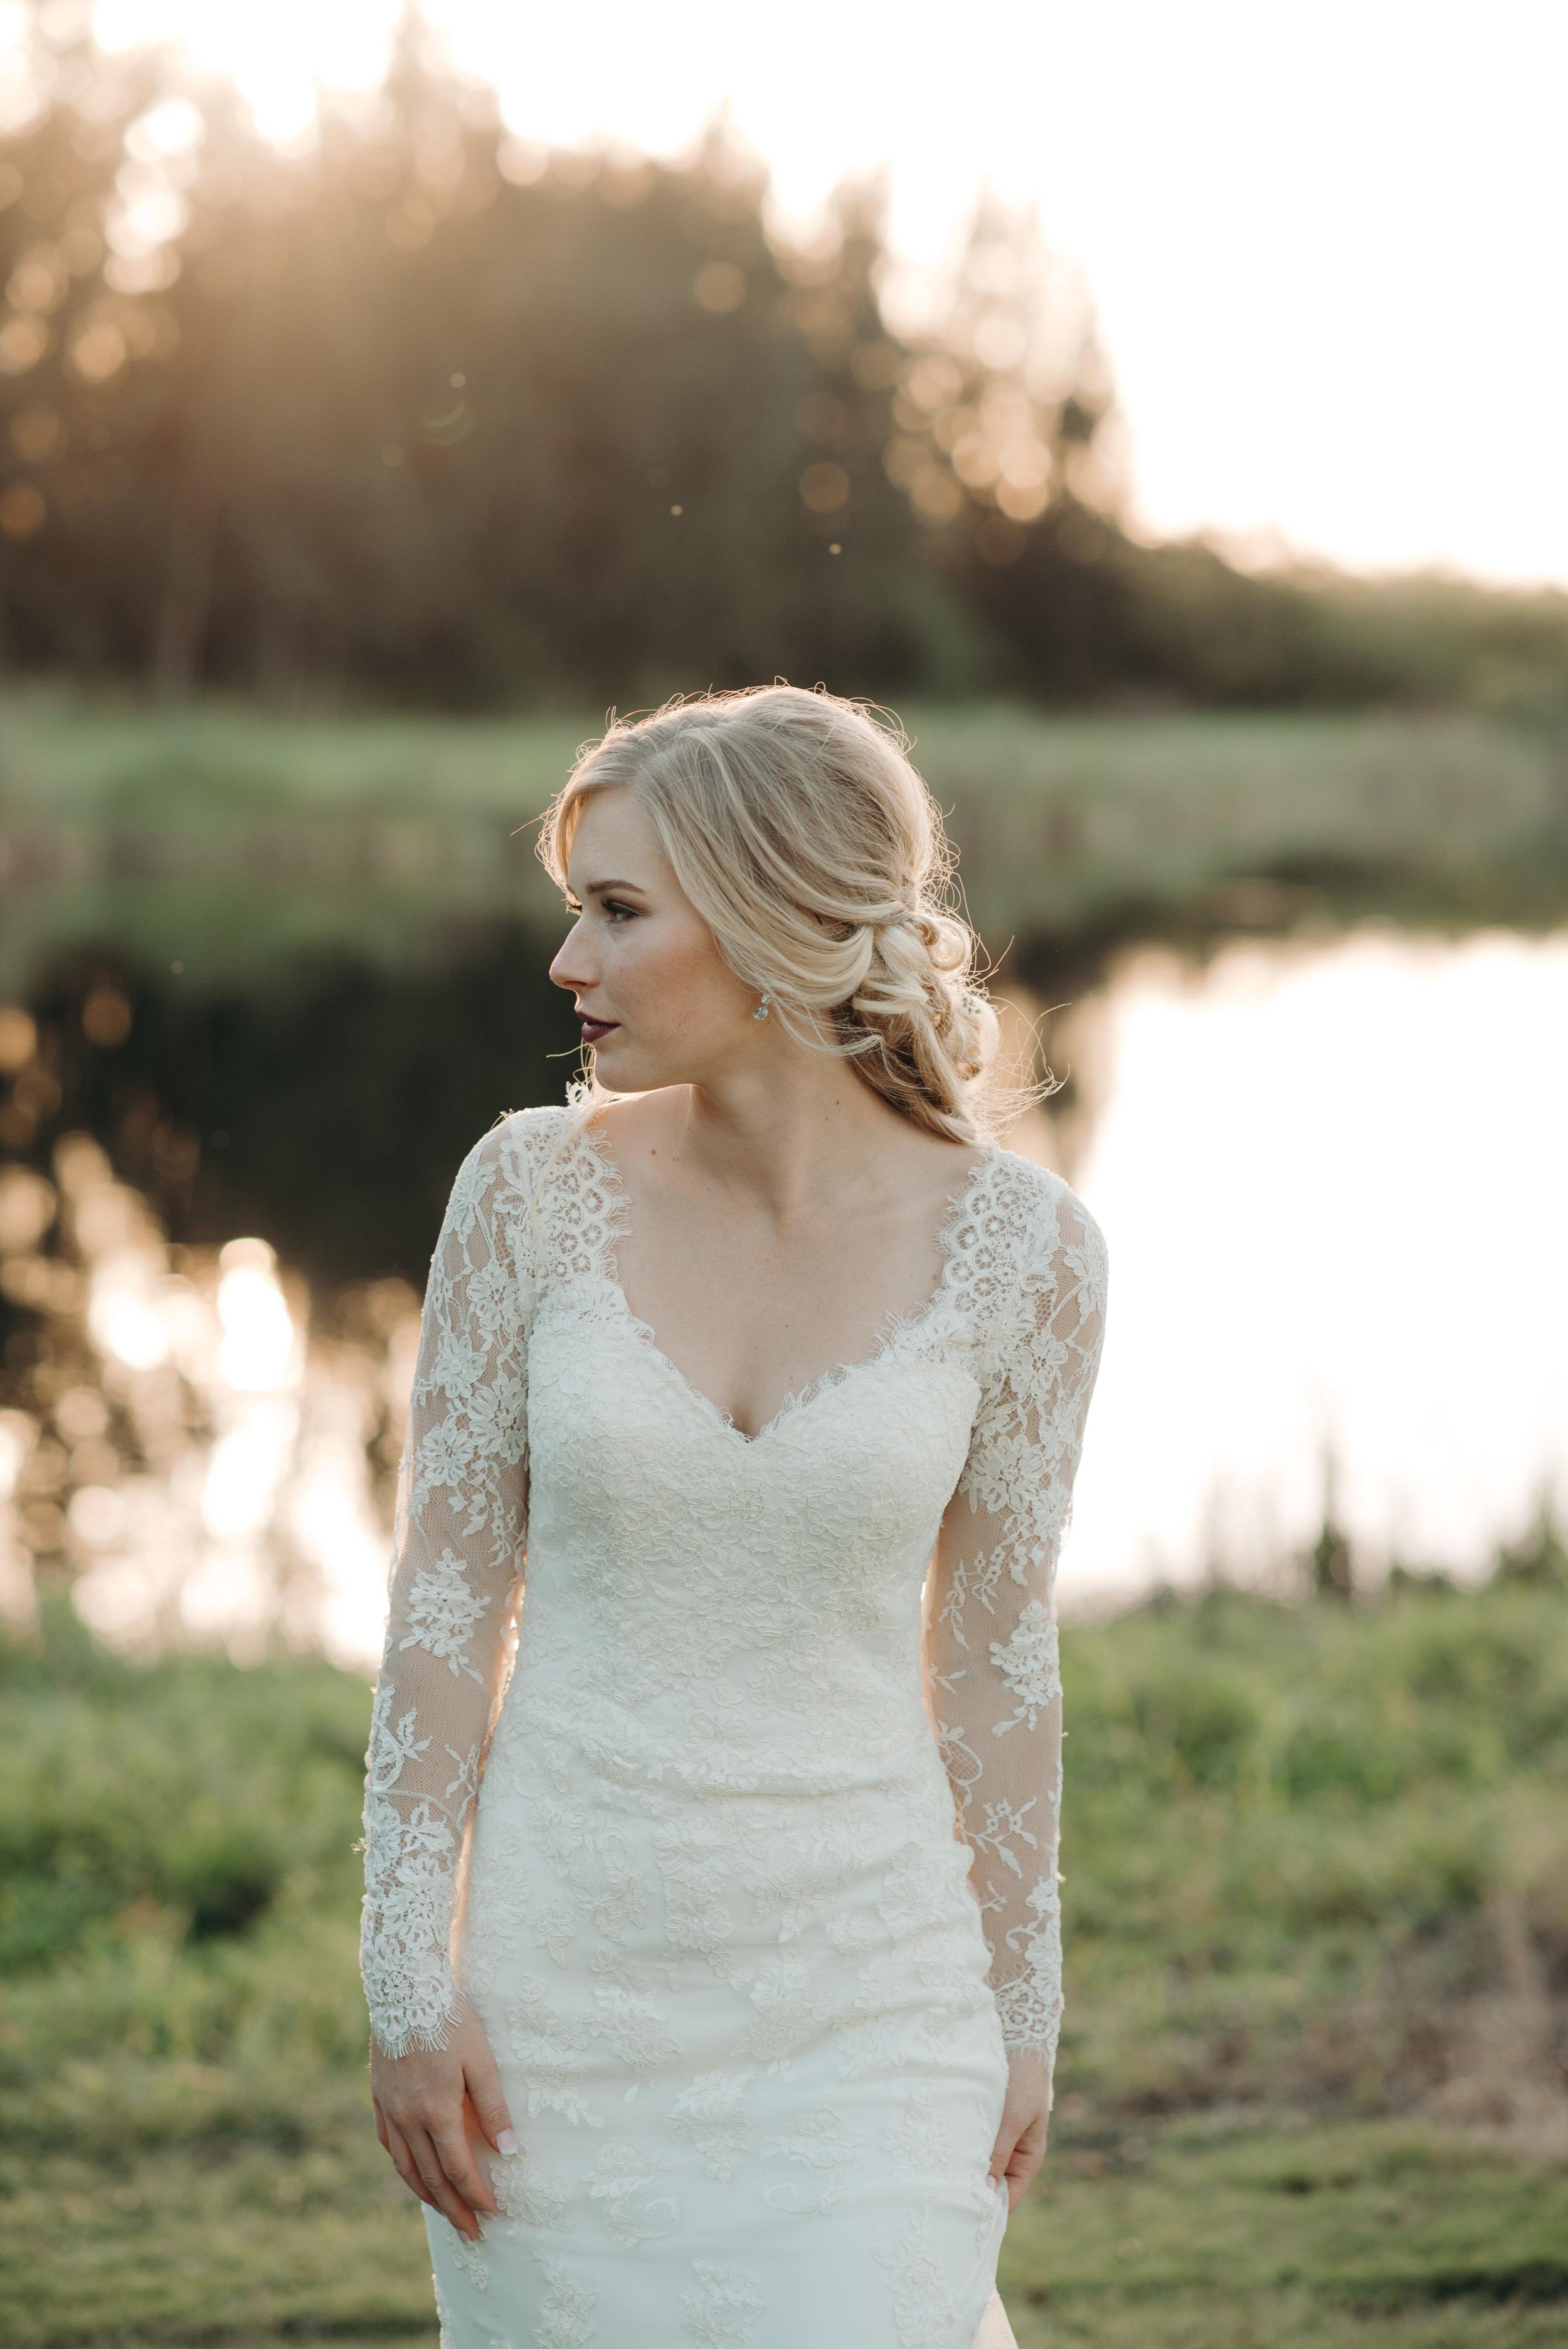 micayla-greyson-neumann-vero-beach-lake-house-winter-white-wedding-photography-835.jpg